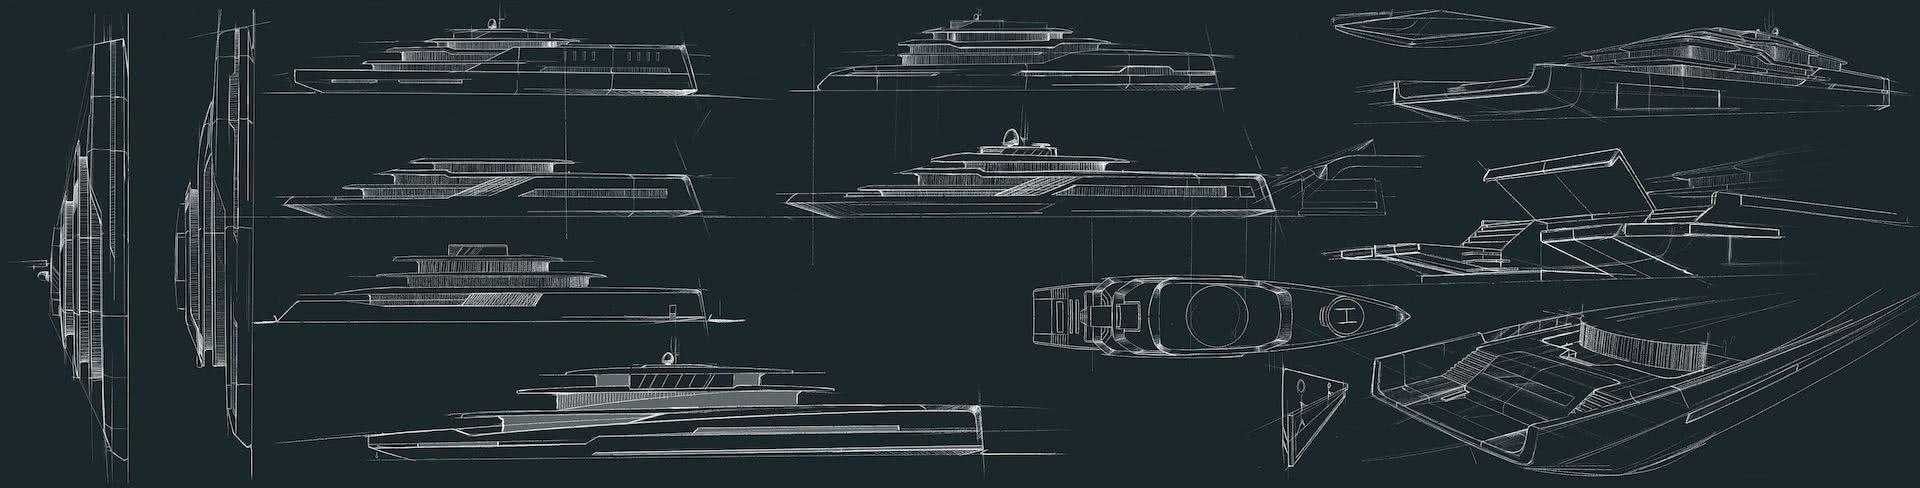 75m Hybrid Yacht BYD Group